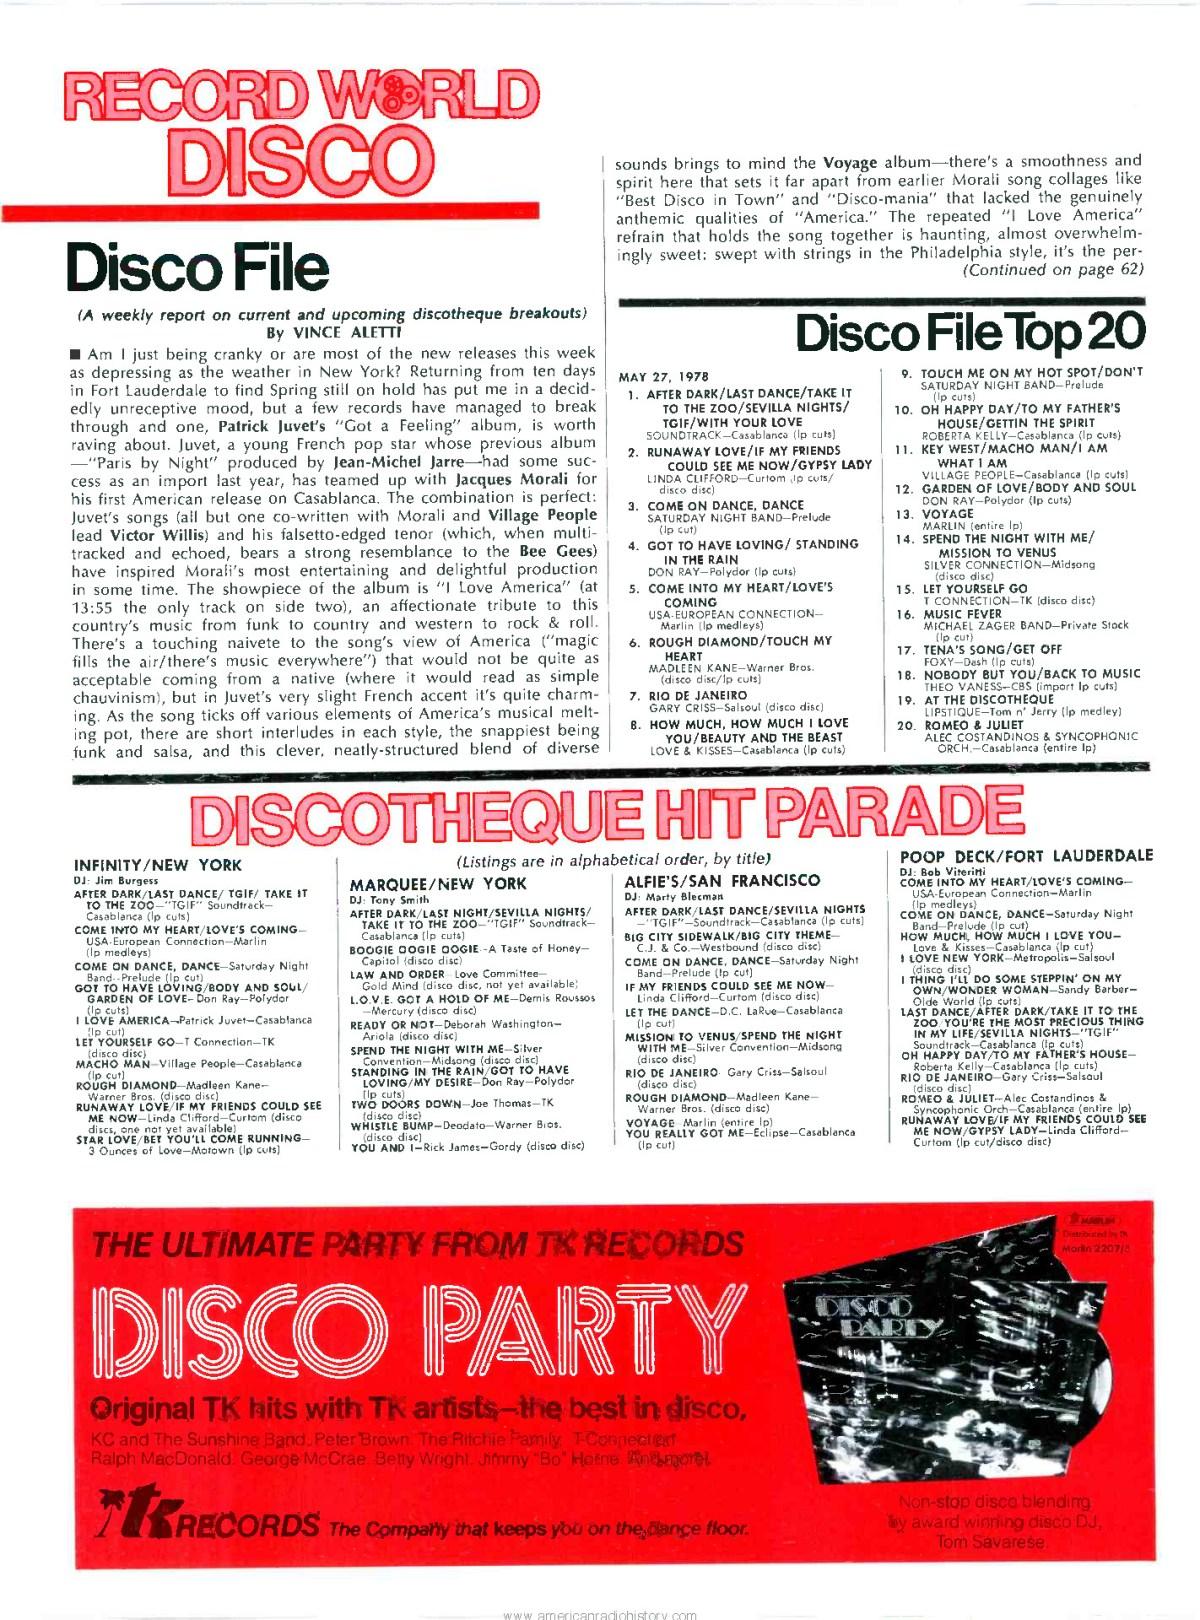 TK Disco Party